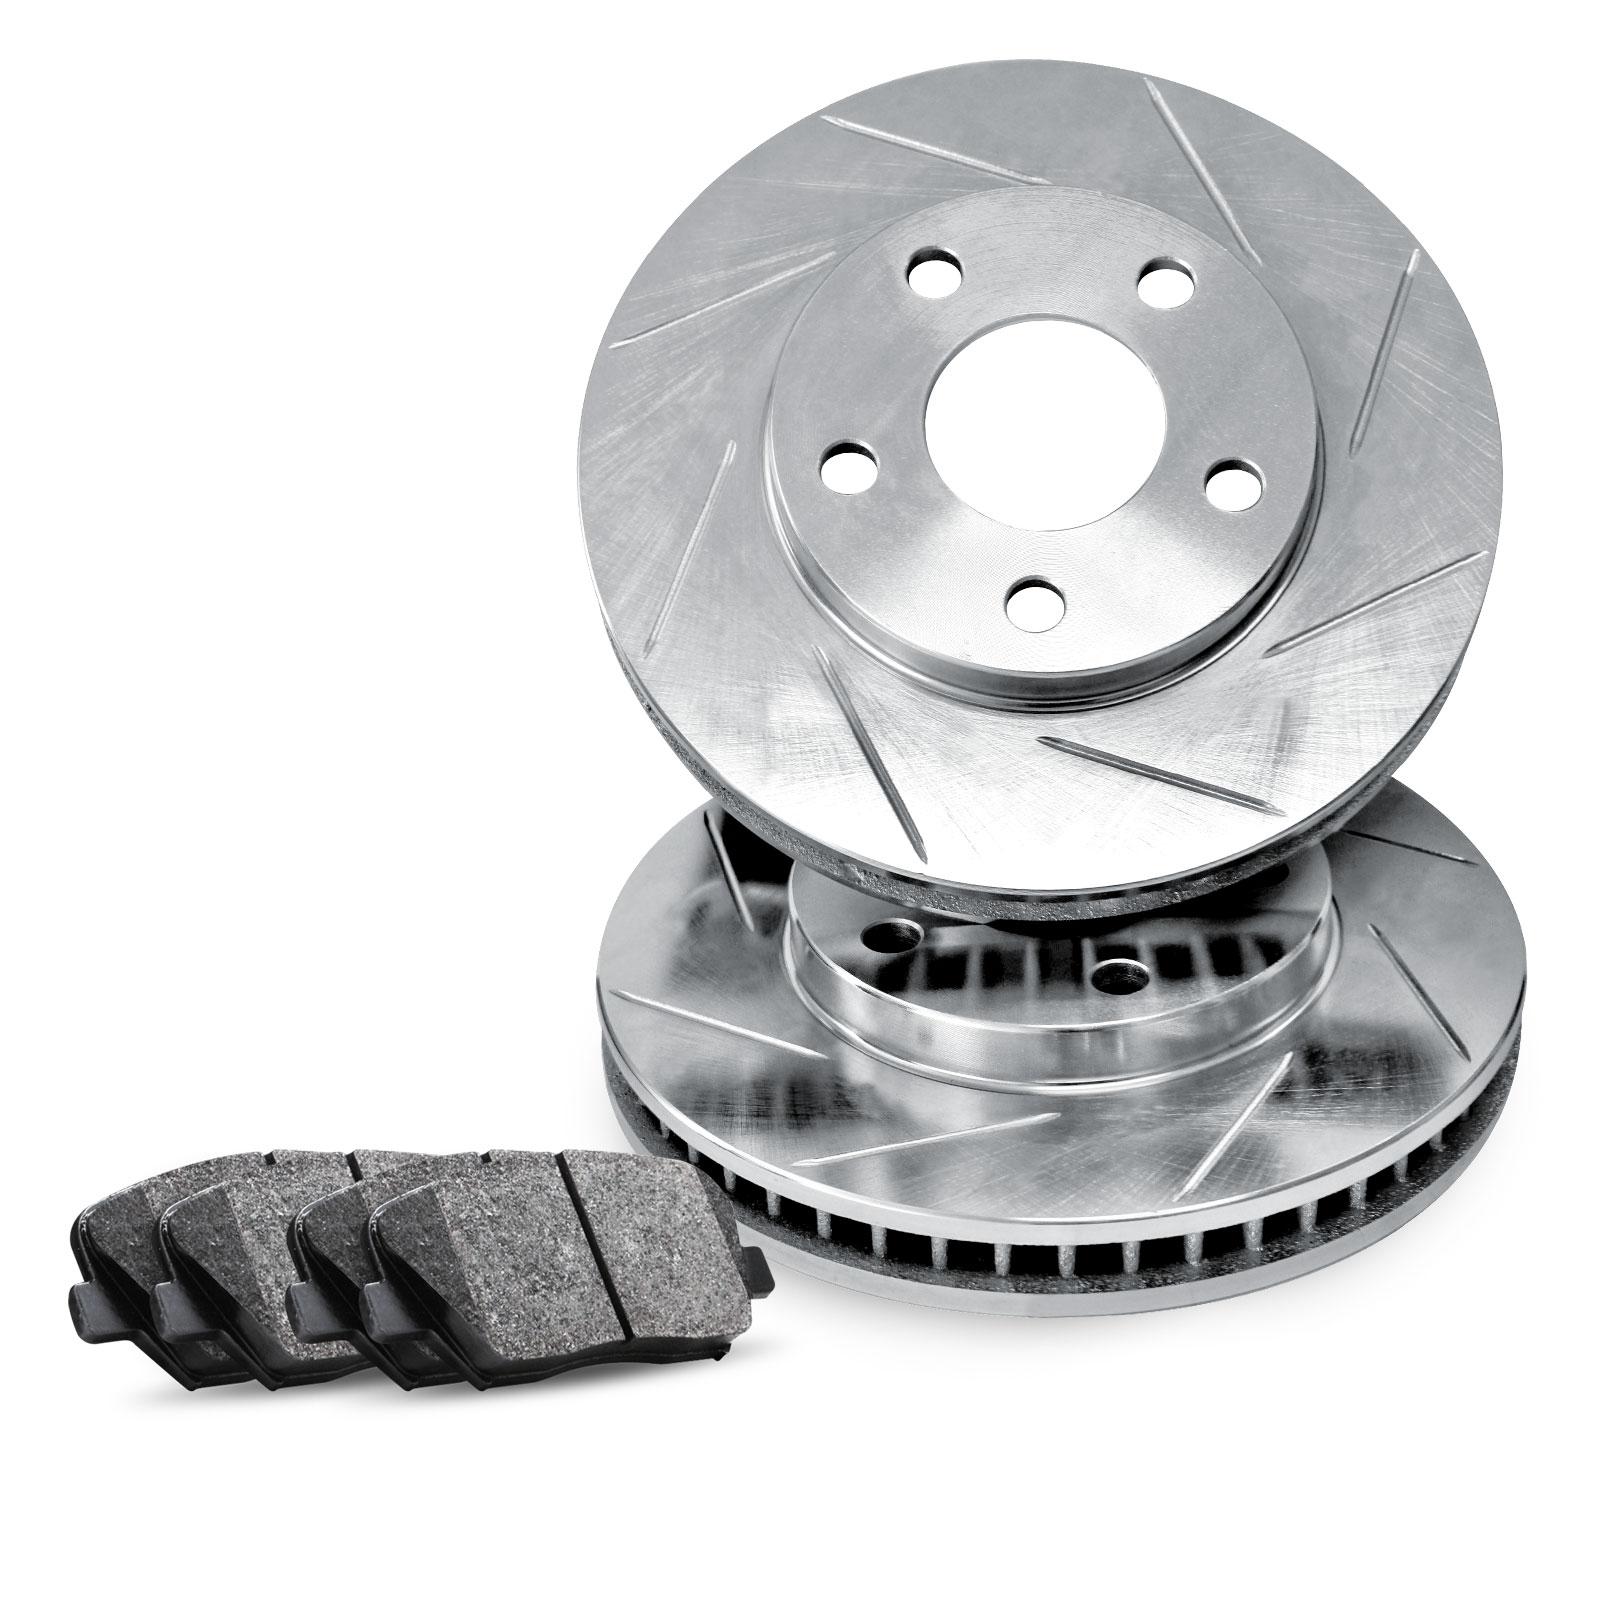 Brake Rotors FRONT KIT ELINE SLOTTED & PADS -Mitsubishi DIAMANTE 1997 - 2004 | eBay